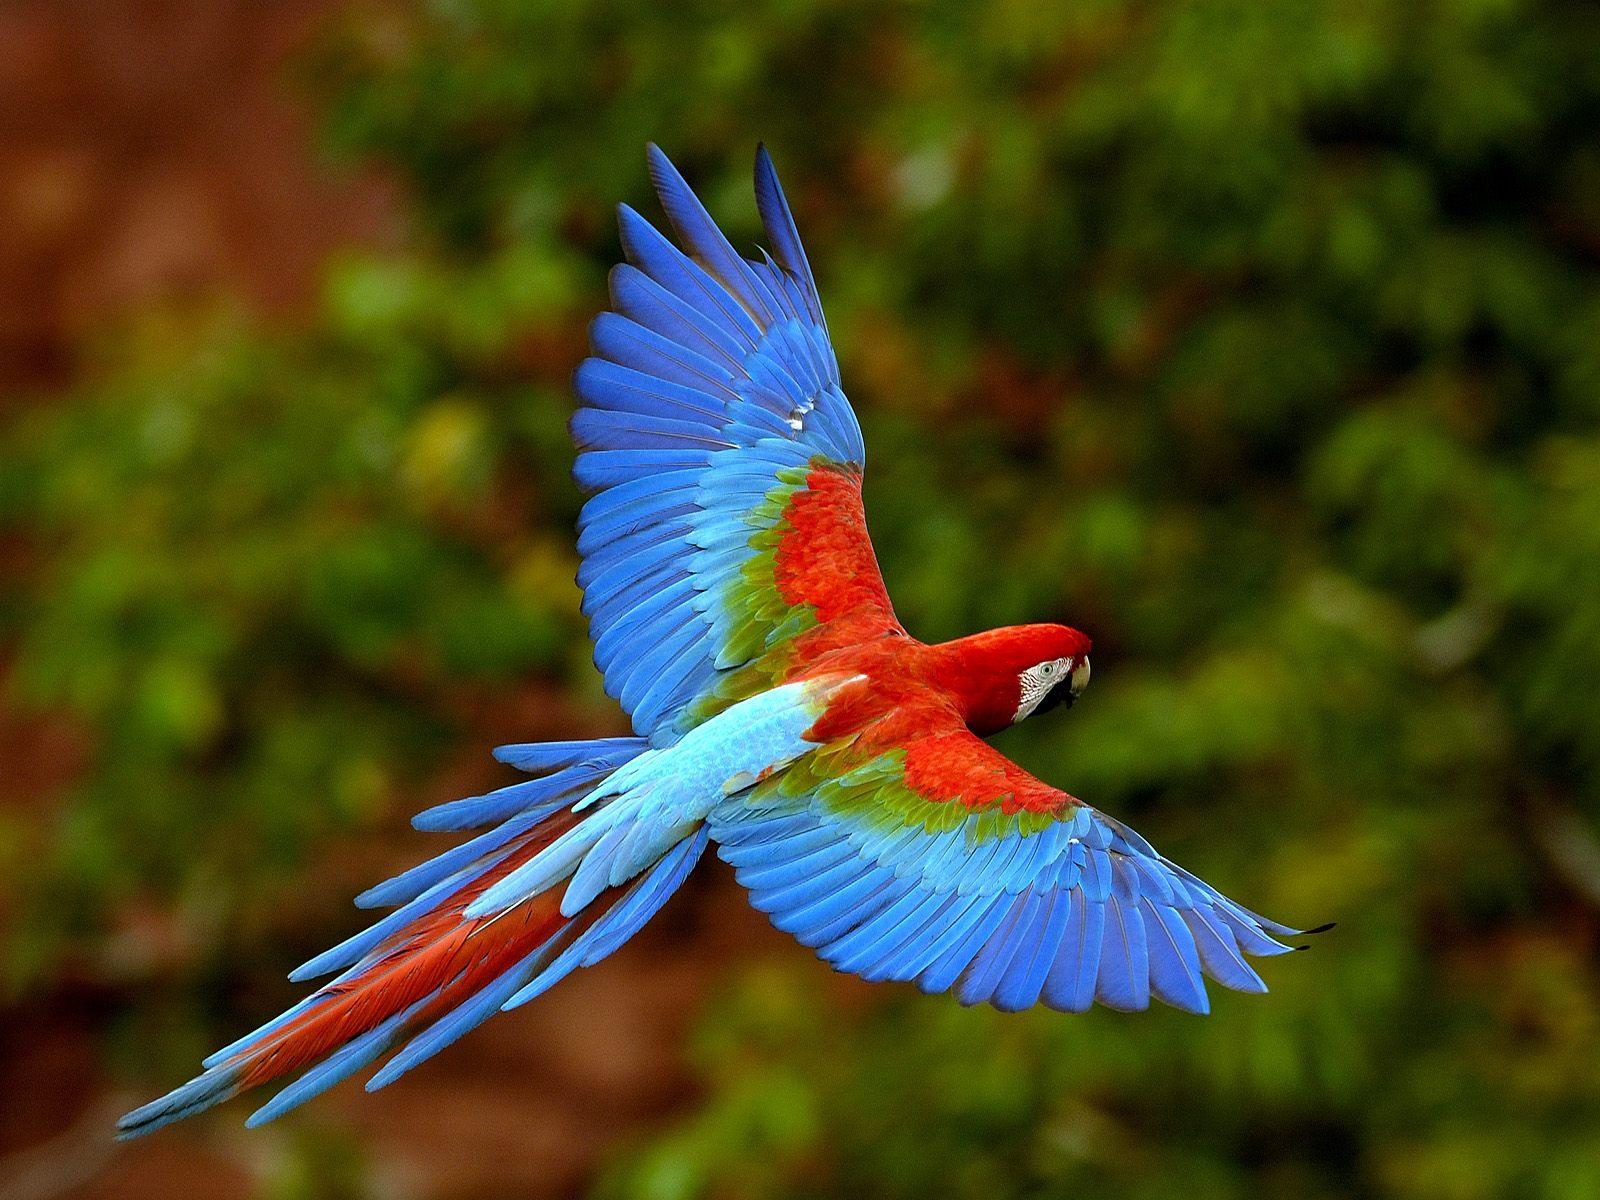 بالصور صور طيور , مجموعه صور طيور زينه رائعه 2404 5